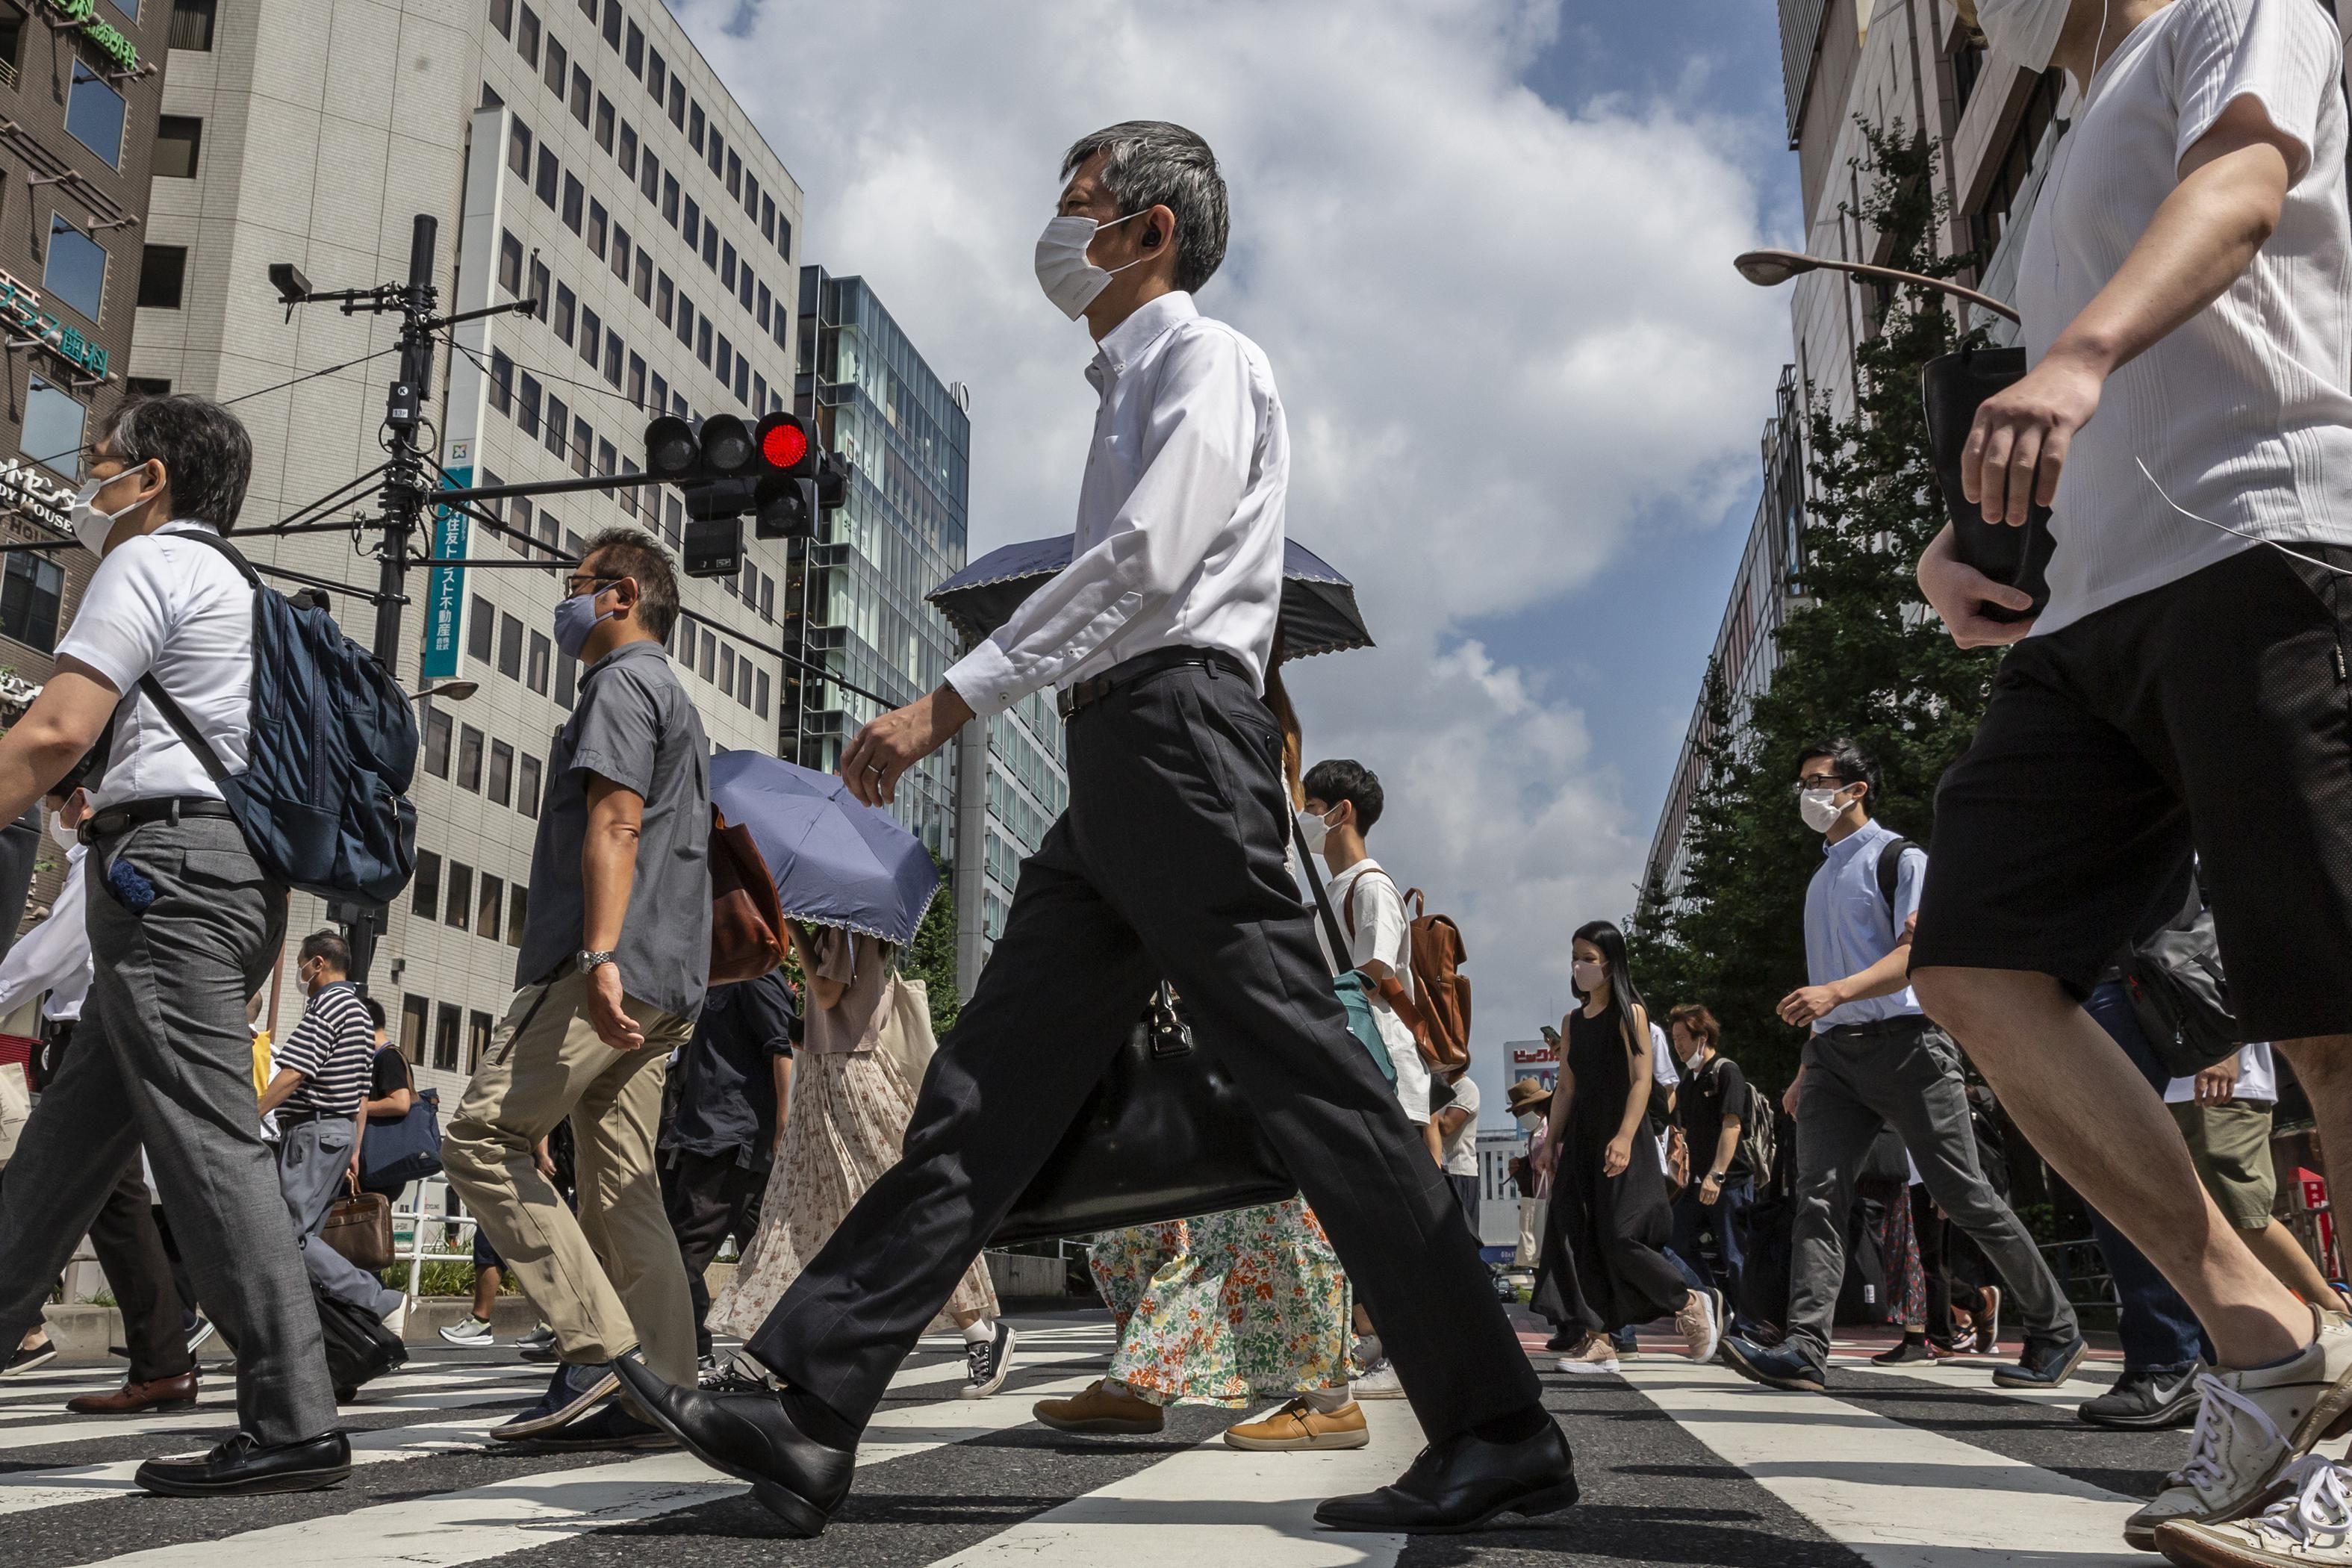 A crowd of people in Japan crossing the street